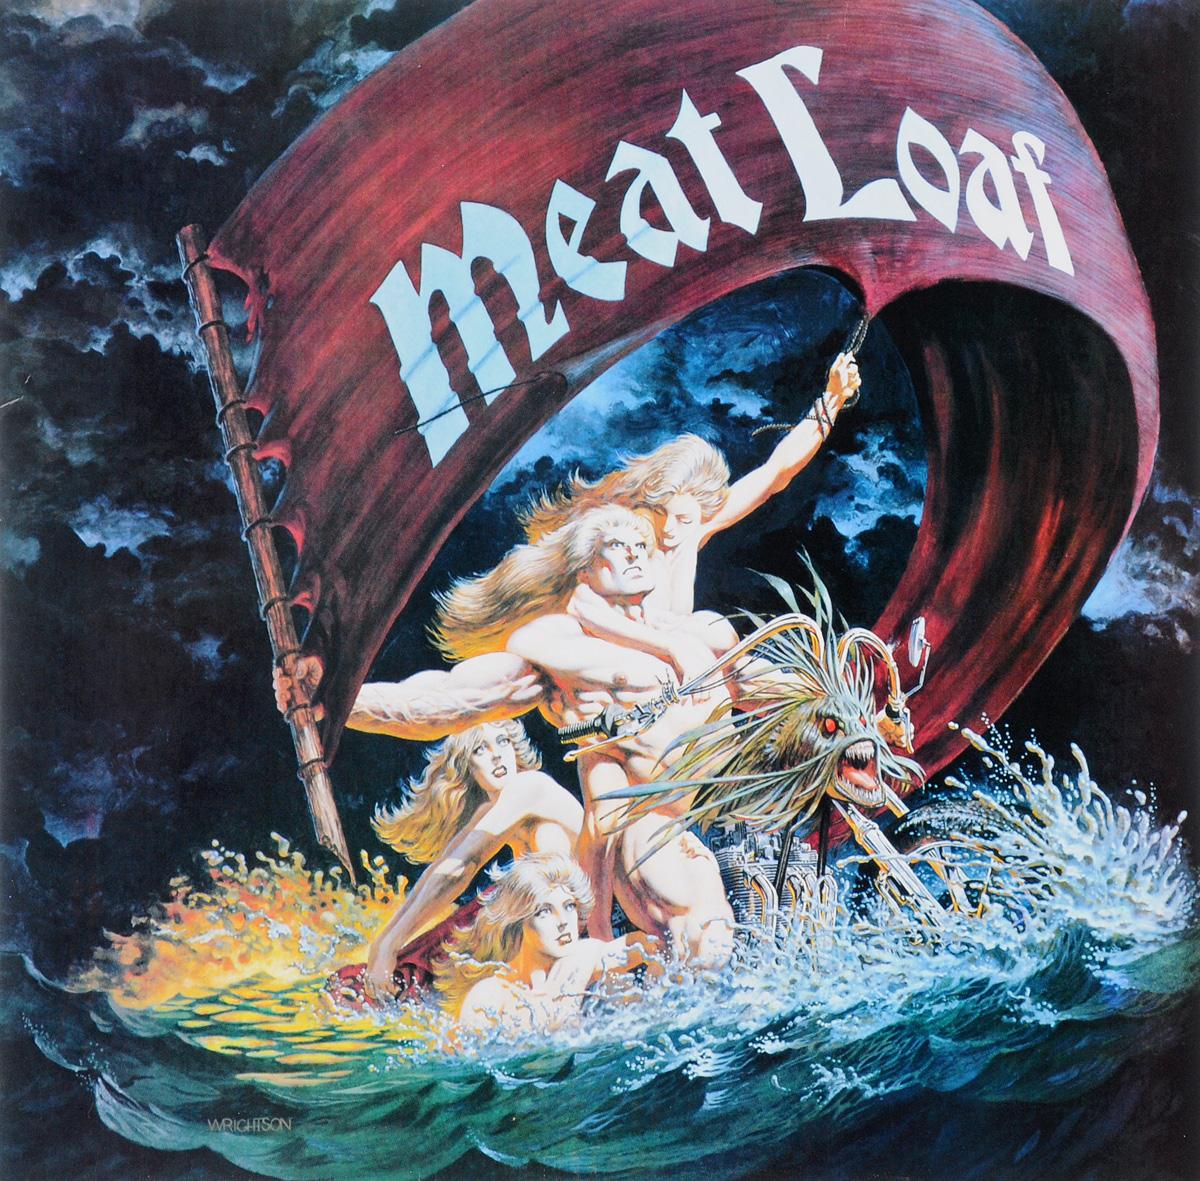 Мит Лоуф Meat Loaf. Dead Ringer (LP) цена 2017